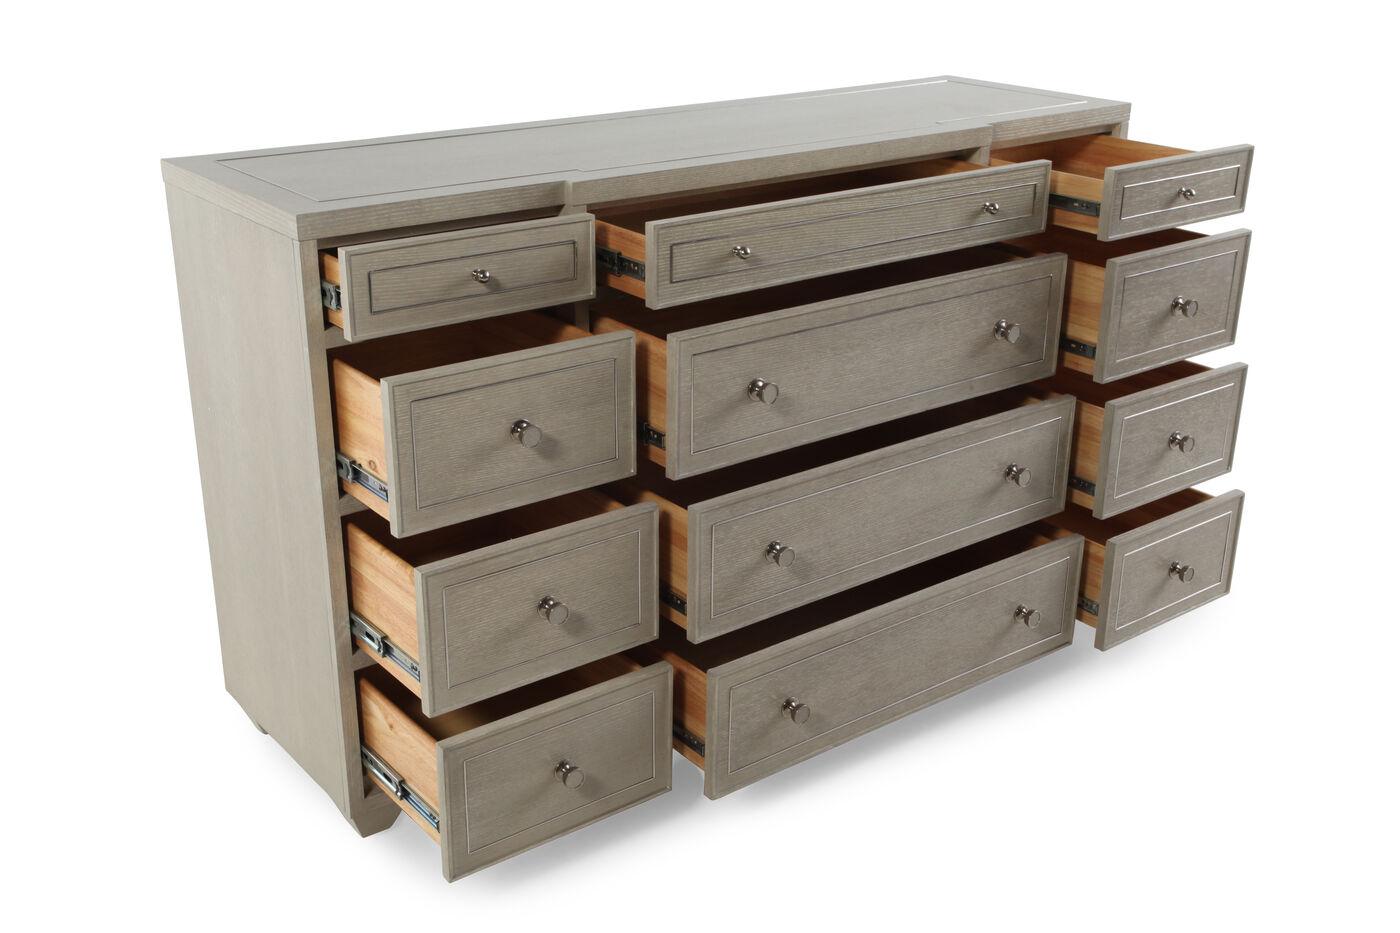 Bernhardt Criteria Dresser | Mathis Brothers Furniture - photo#26